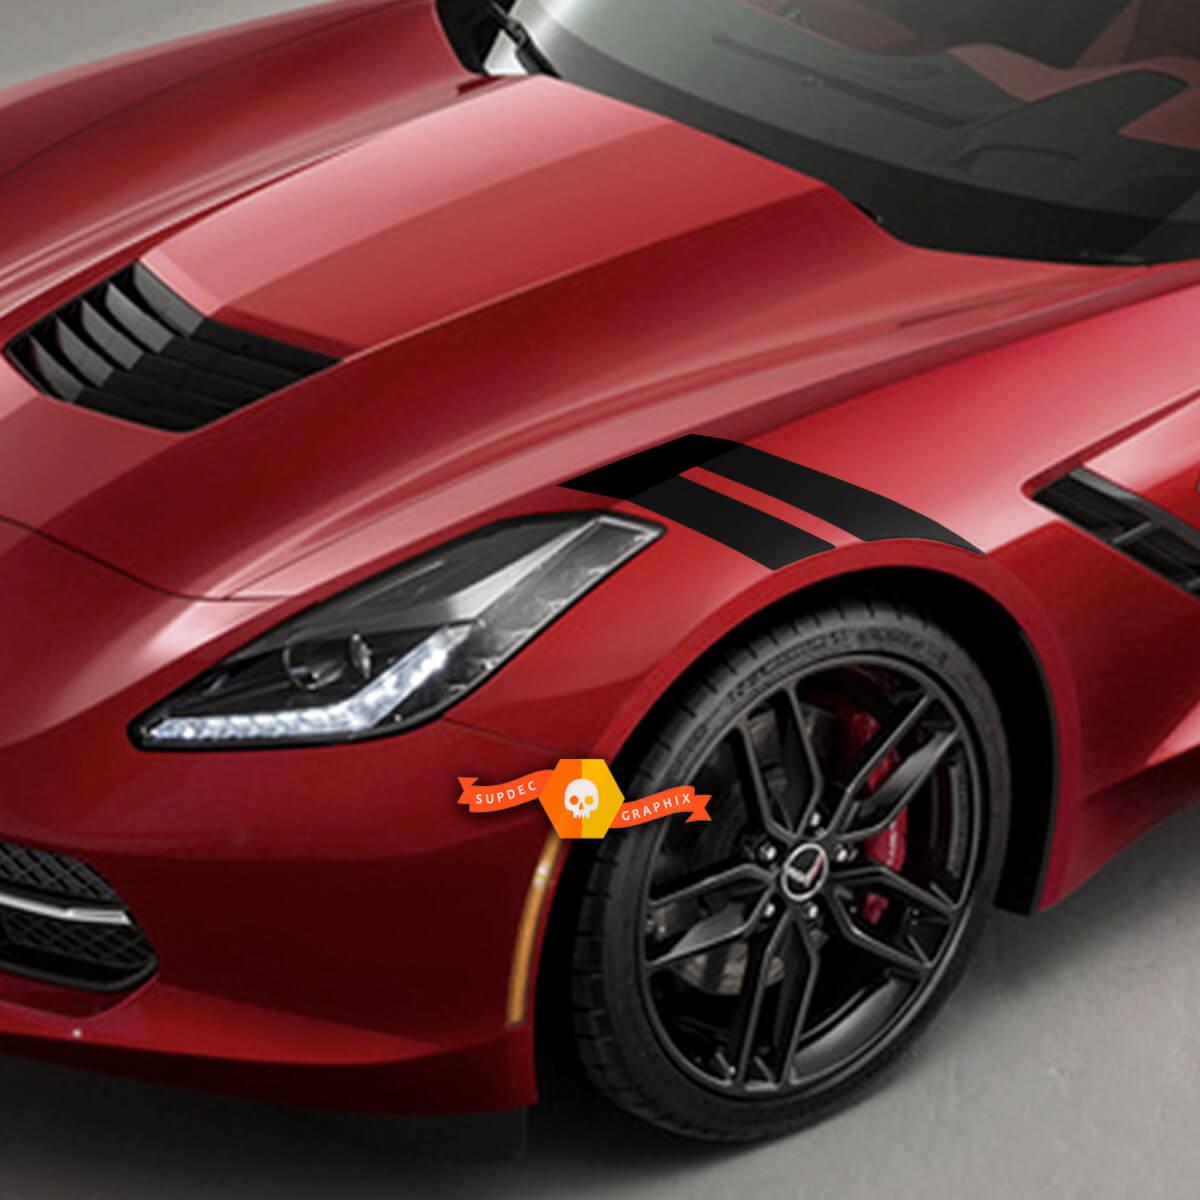 Chevrolet Corvette C7 Sider Seitenstreifen Sport Racing Double Decals